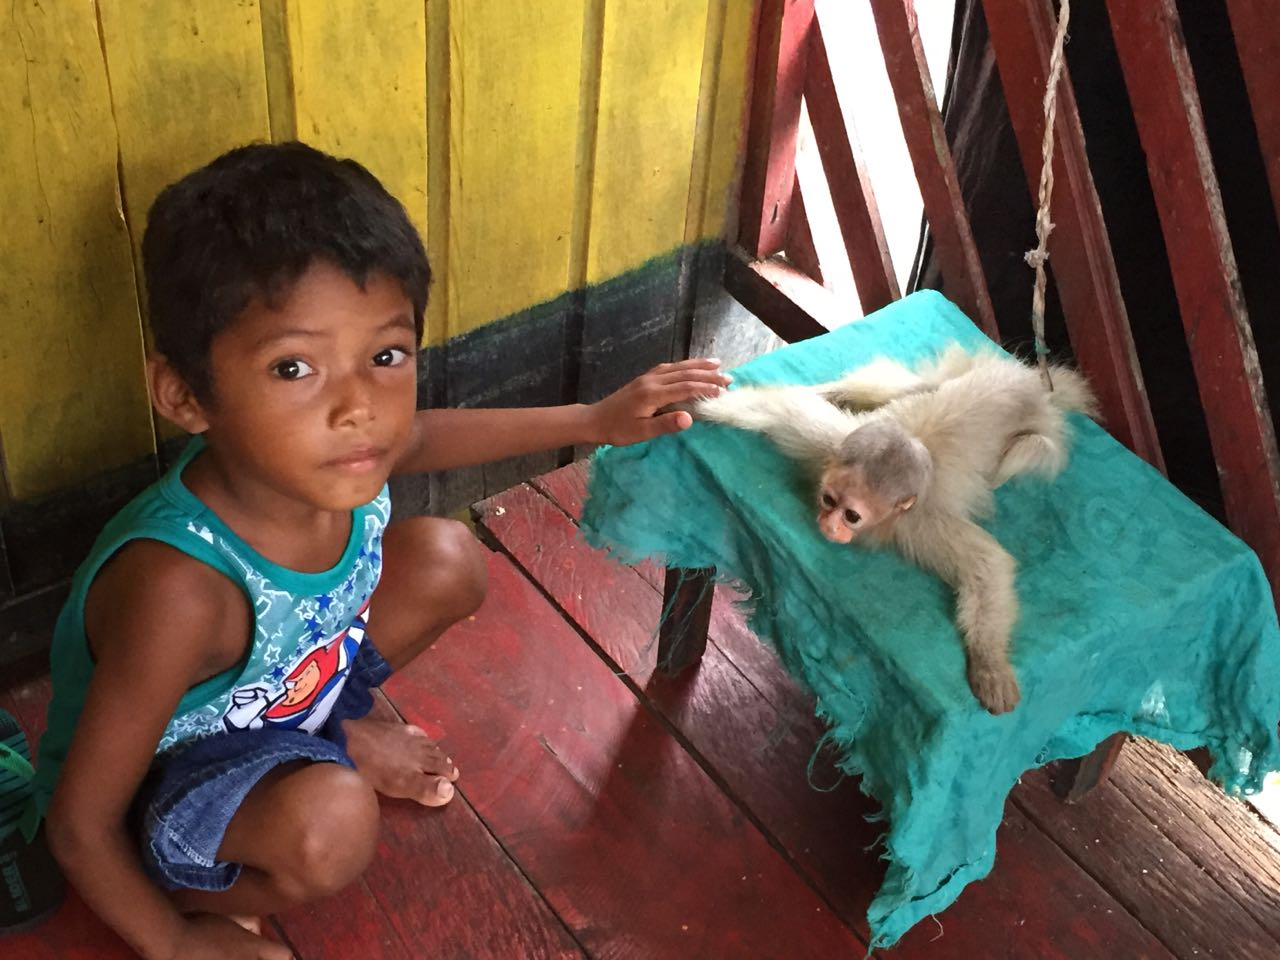 A small boy in eirunepe has a pet uakari.